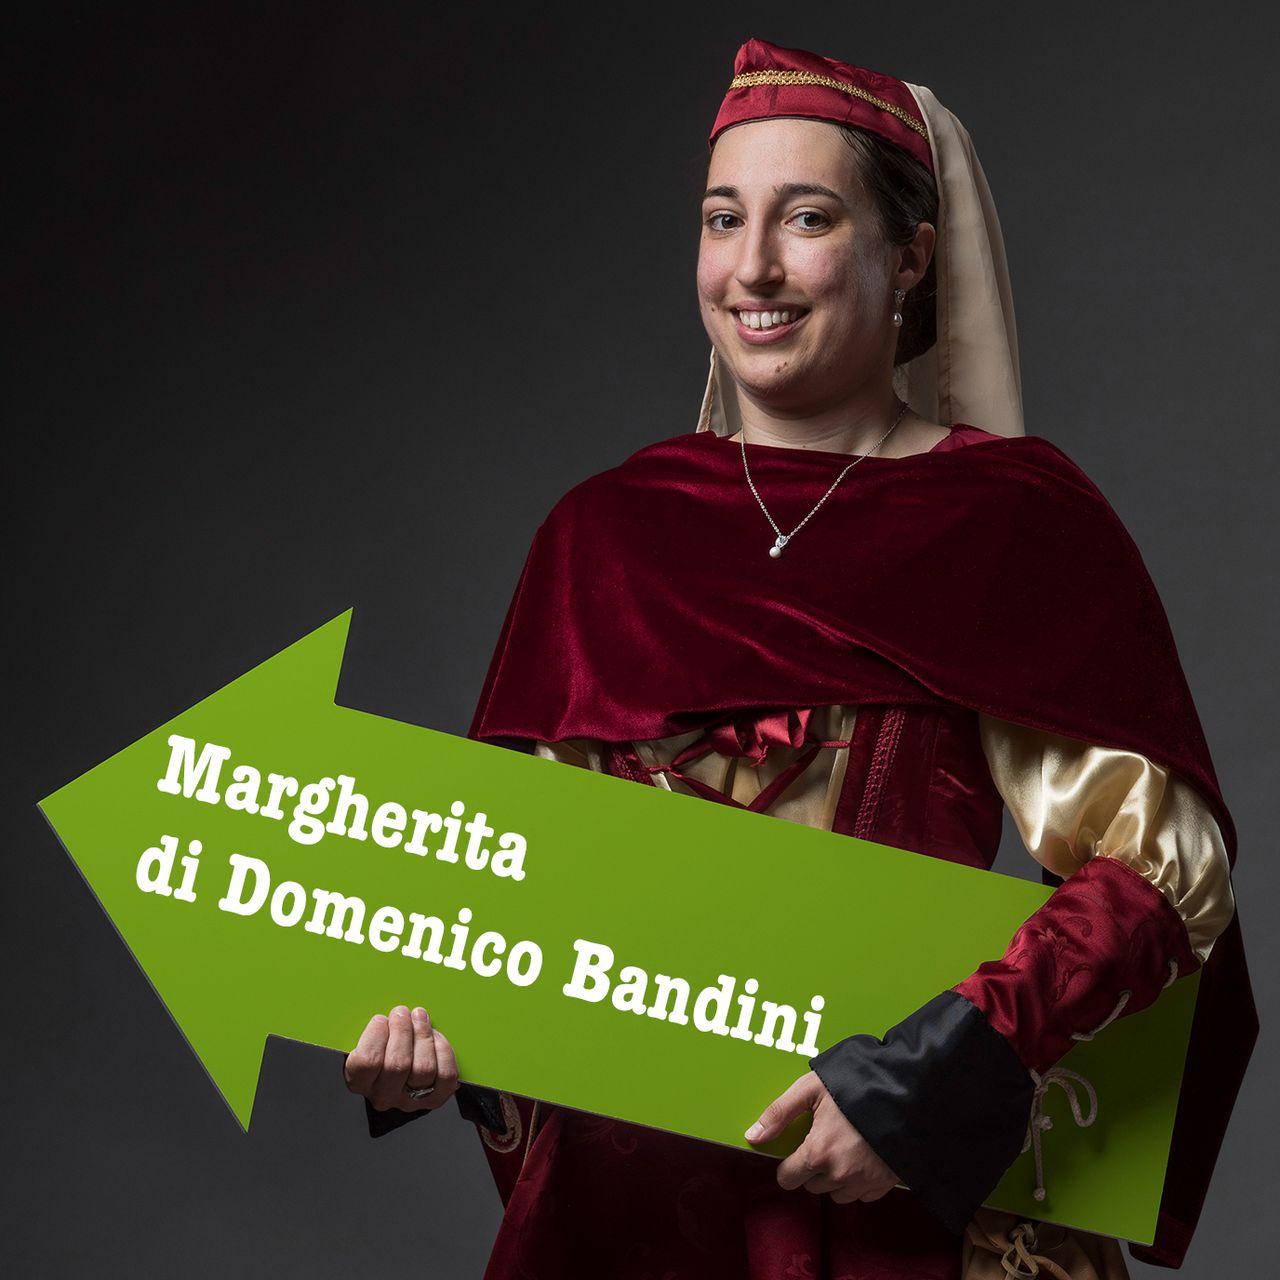 Zeitreise ins Mittelalter mit: Margherita di Domencio Bandini